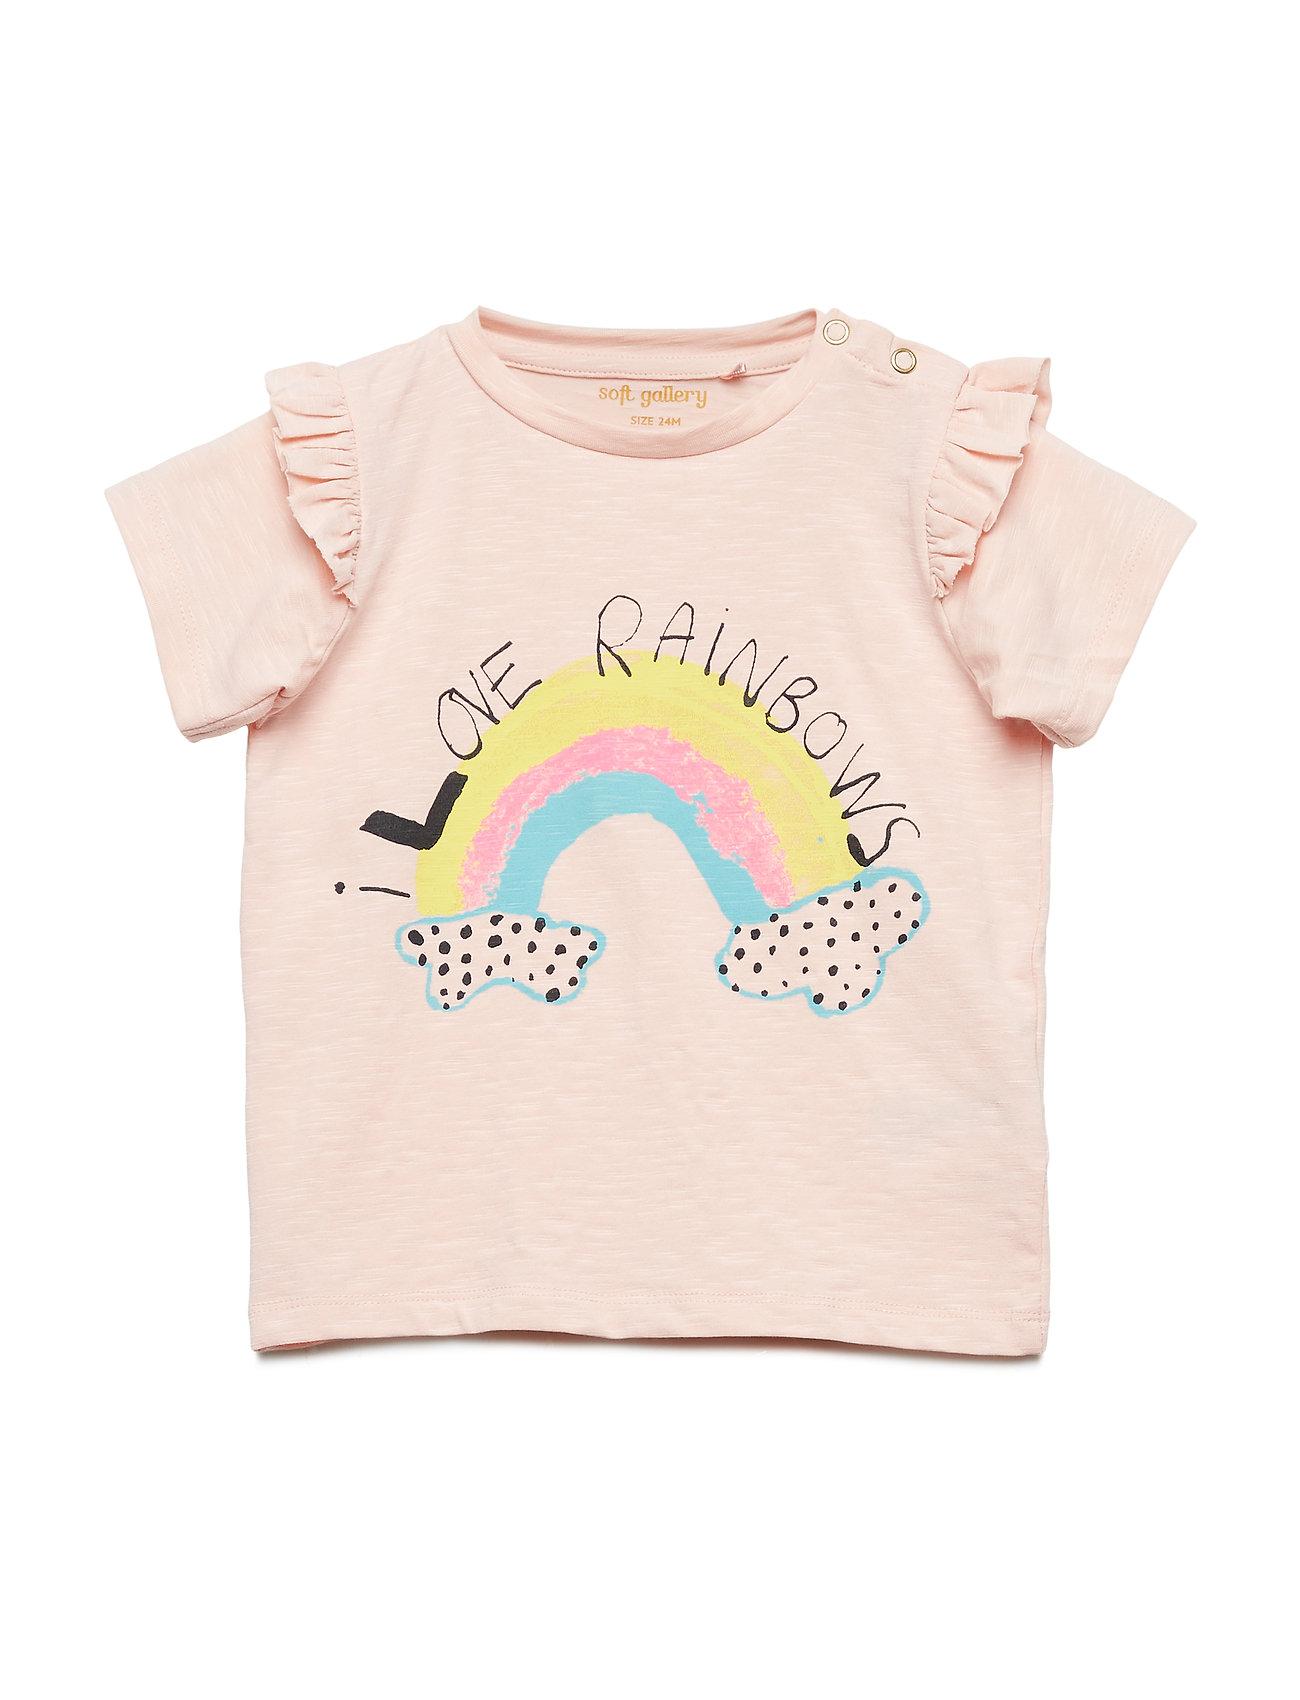 Soft Gallery Sif T-shirt - CHINTZ ROSE, RAINBOW